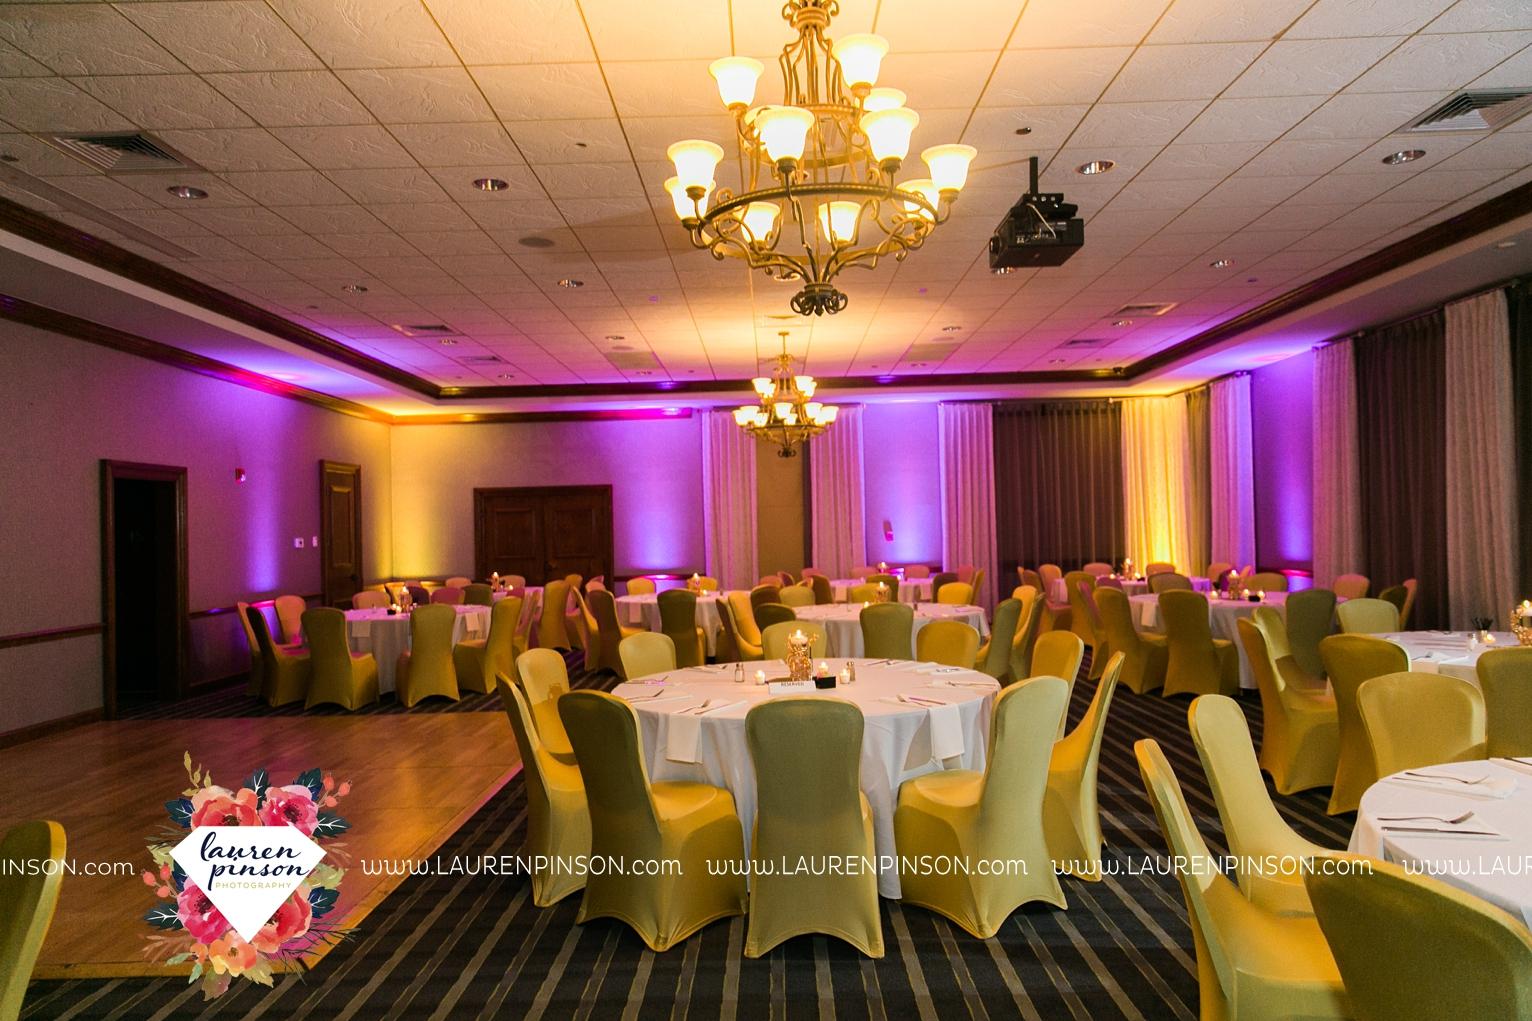 gainesville-texas-sherman-texas-thackerville-oklahoma-wedding-photographer-at-winstar-casino-golf-resort_2300.jpg